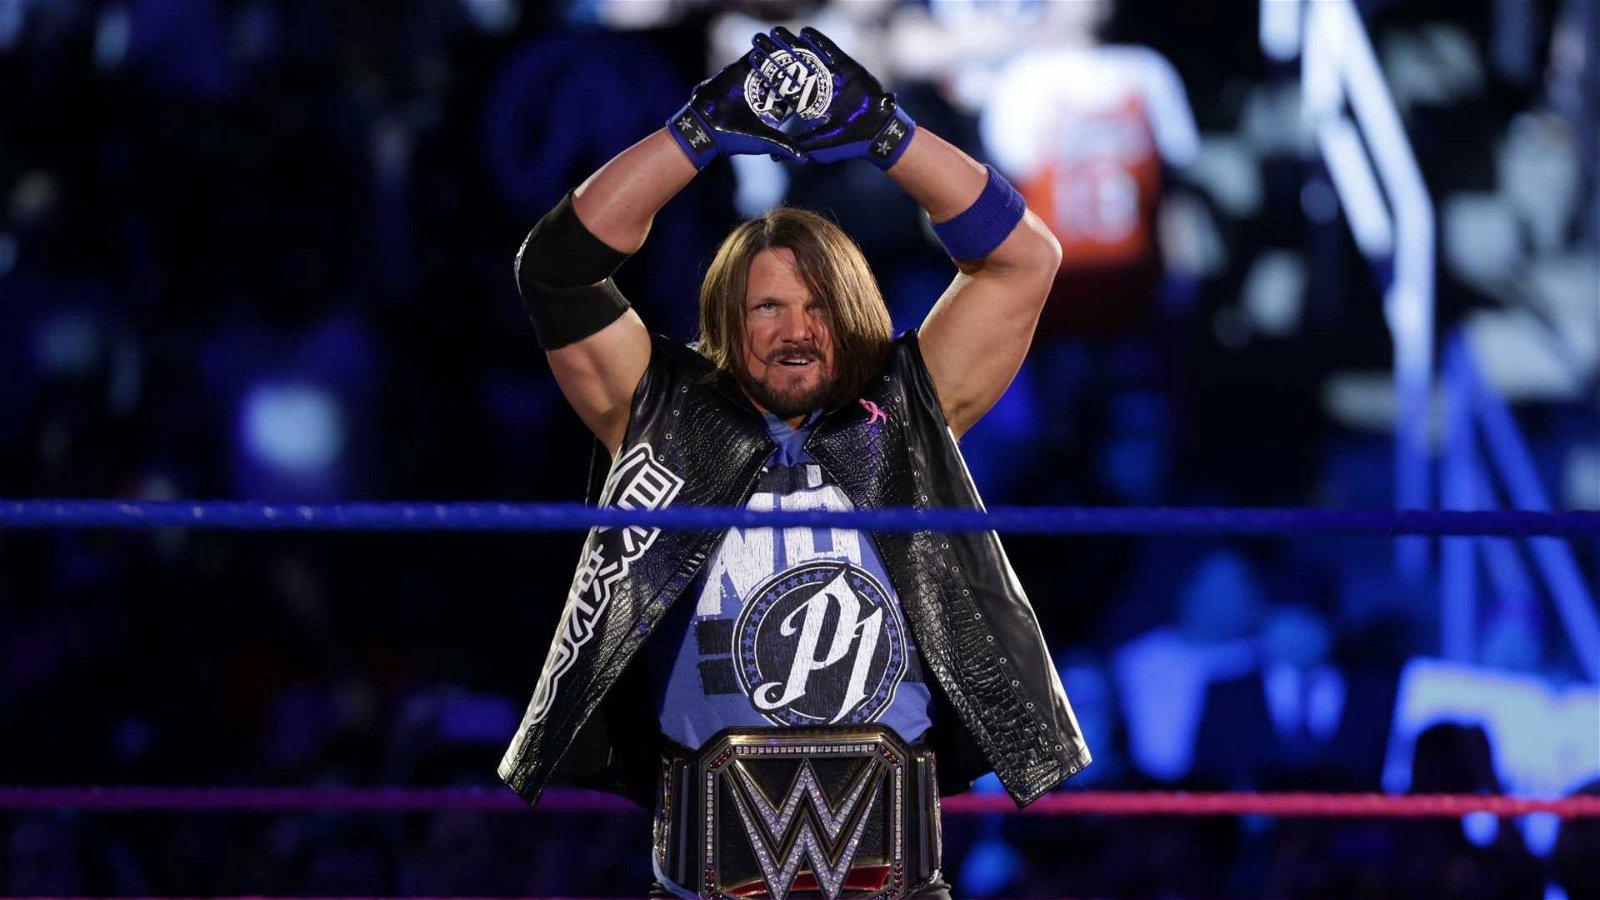 AJ Styles Joins the WWE 2K19 Million Dollar Smackdown 3